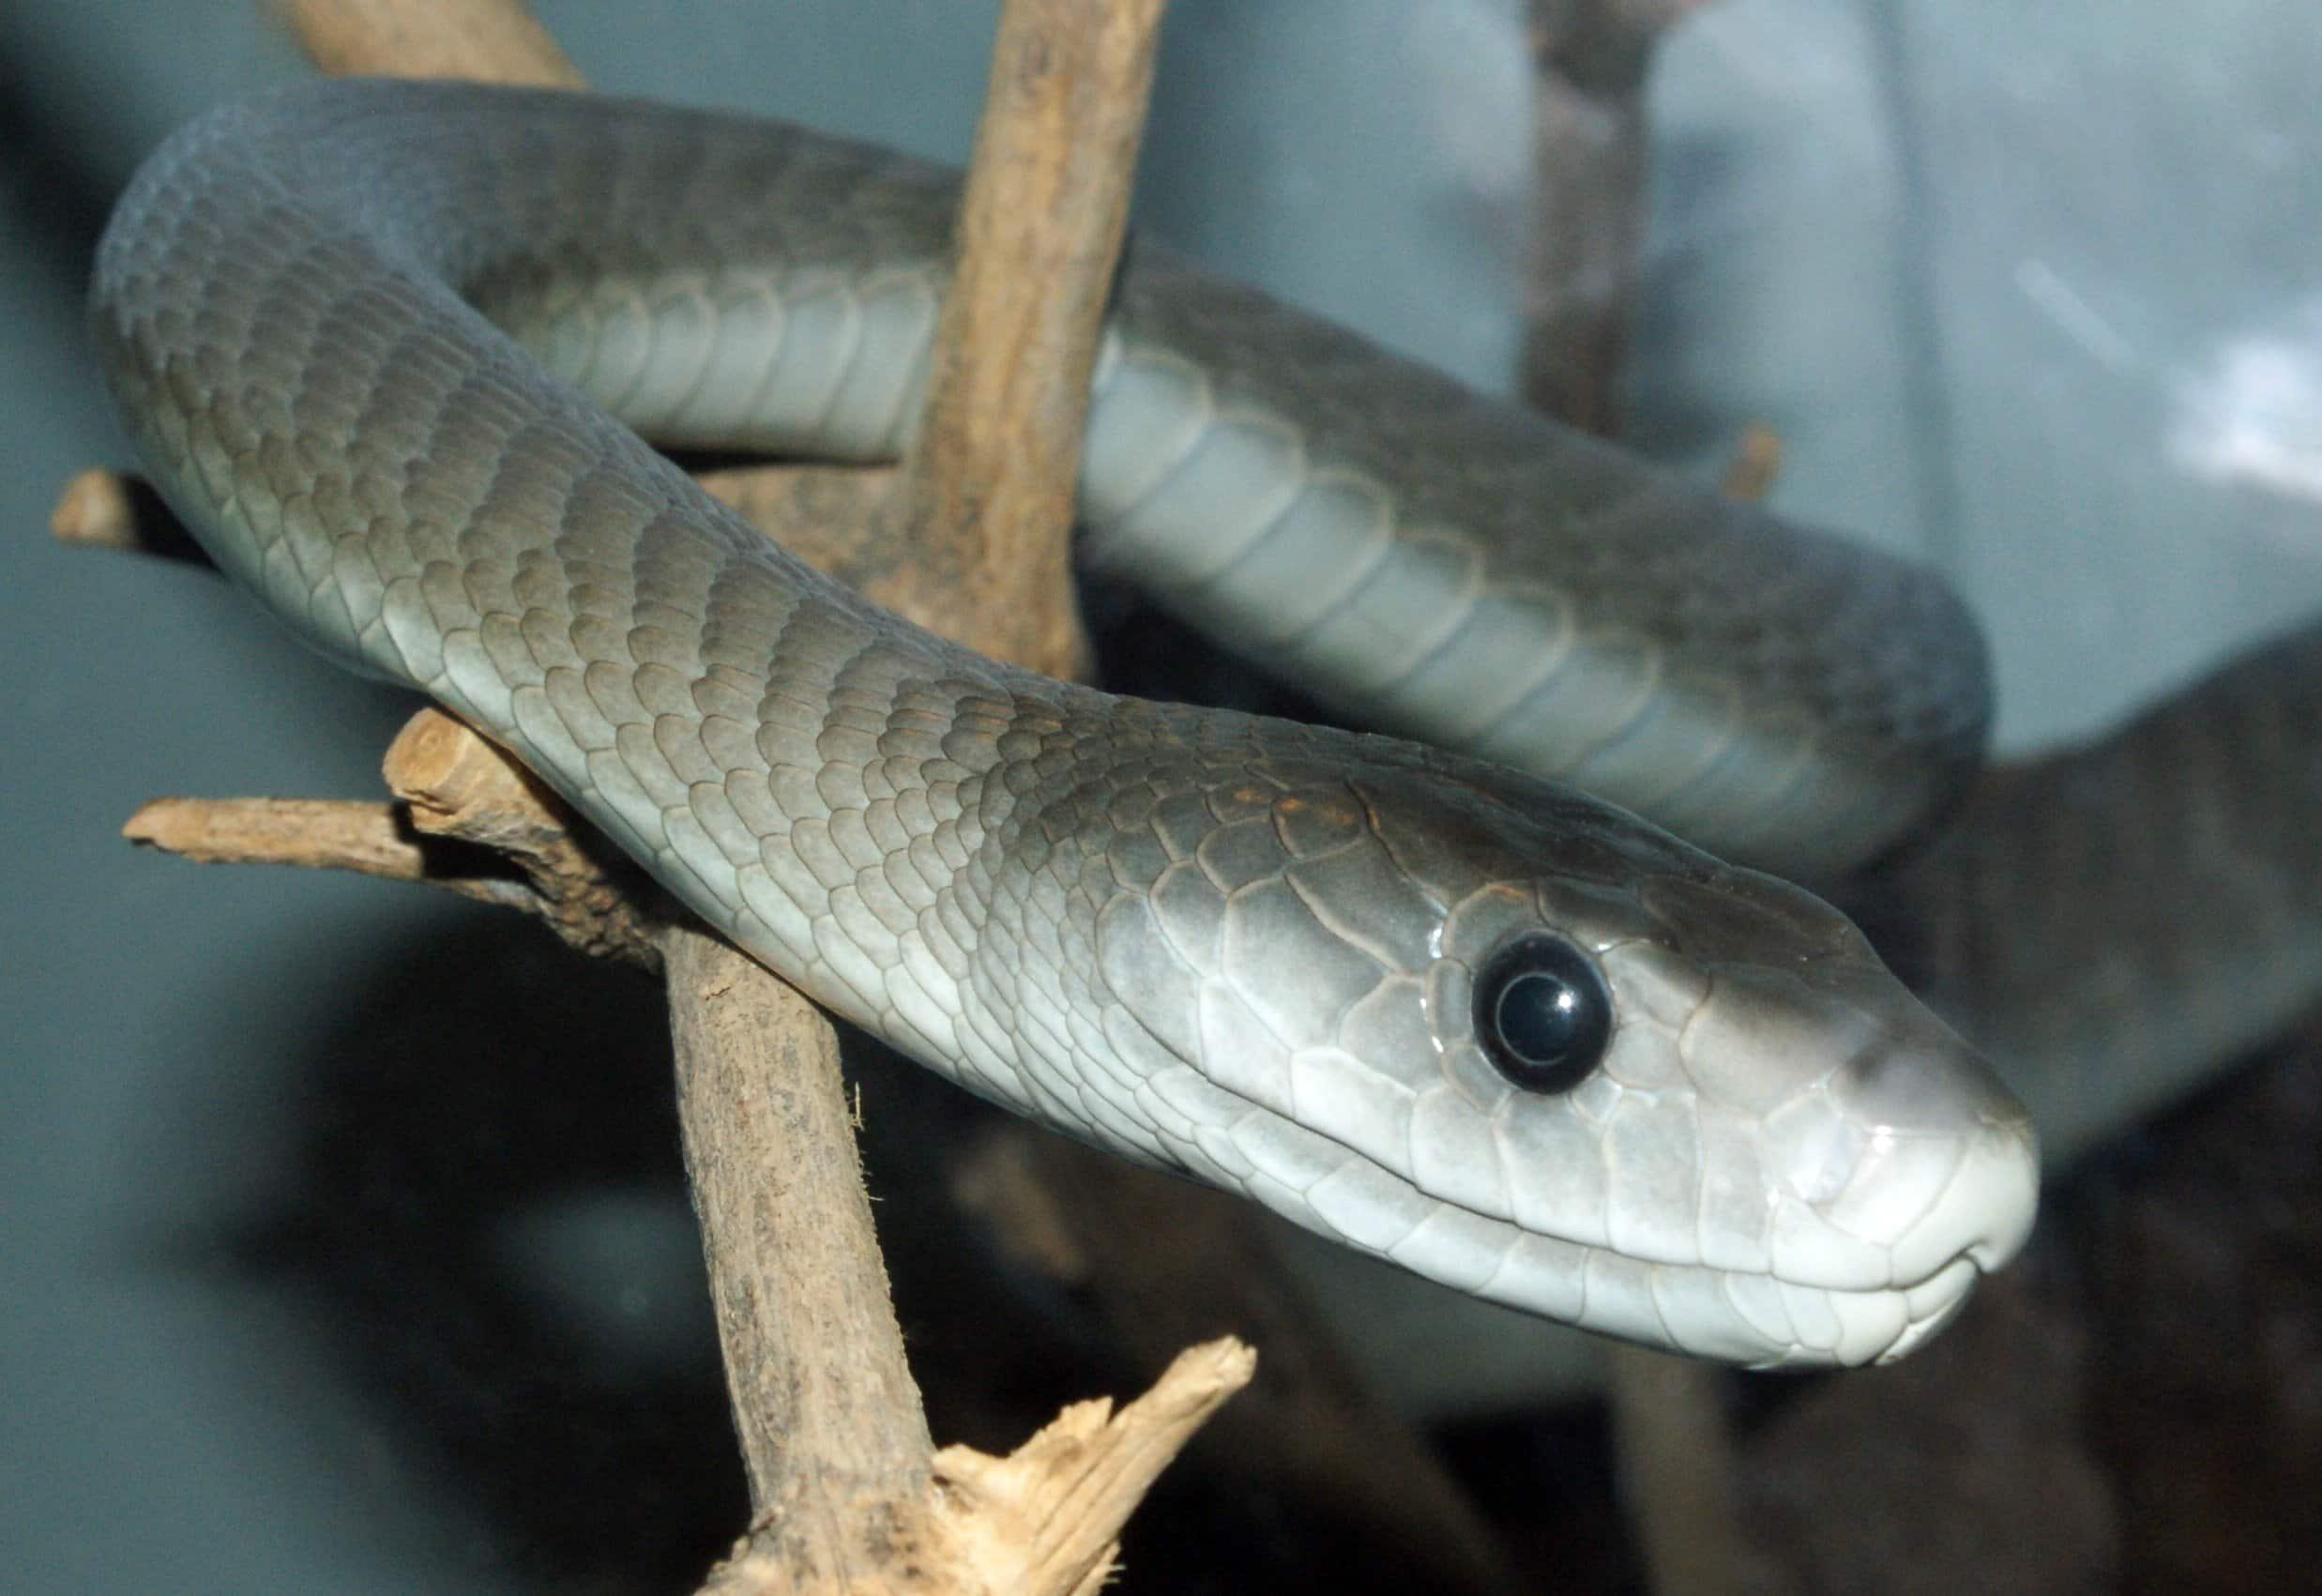 Black and Green Mamba Snake - Hluhluwe Game Reserve